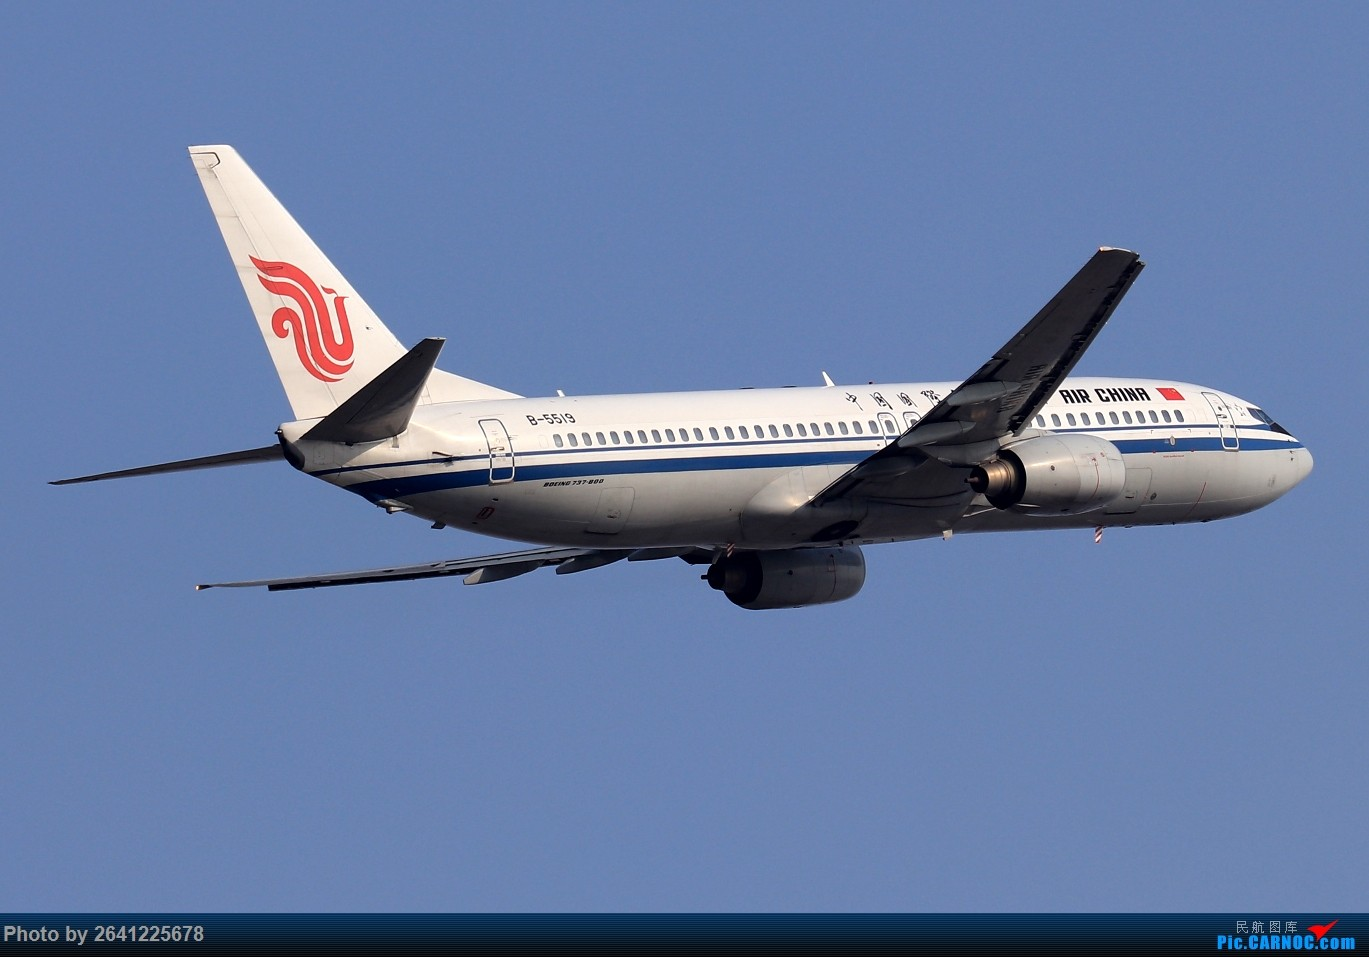 Re:[原创]【TSN】天津滨海国际机场半日游(按注册号1~9发图) BOEING 737-800 B-5519 中国天津滨海国际机场